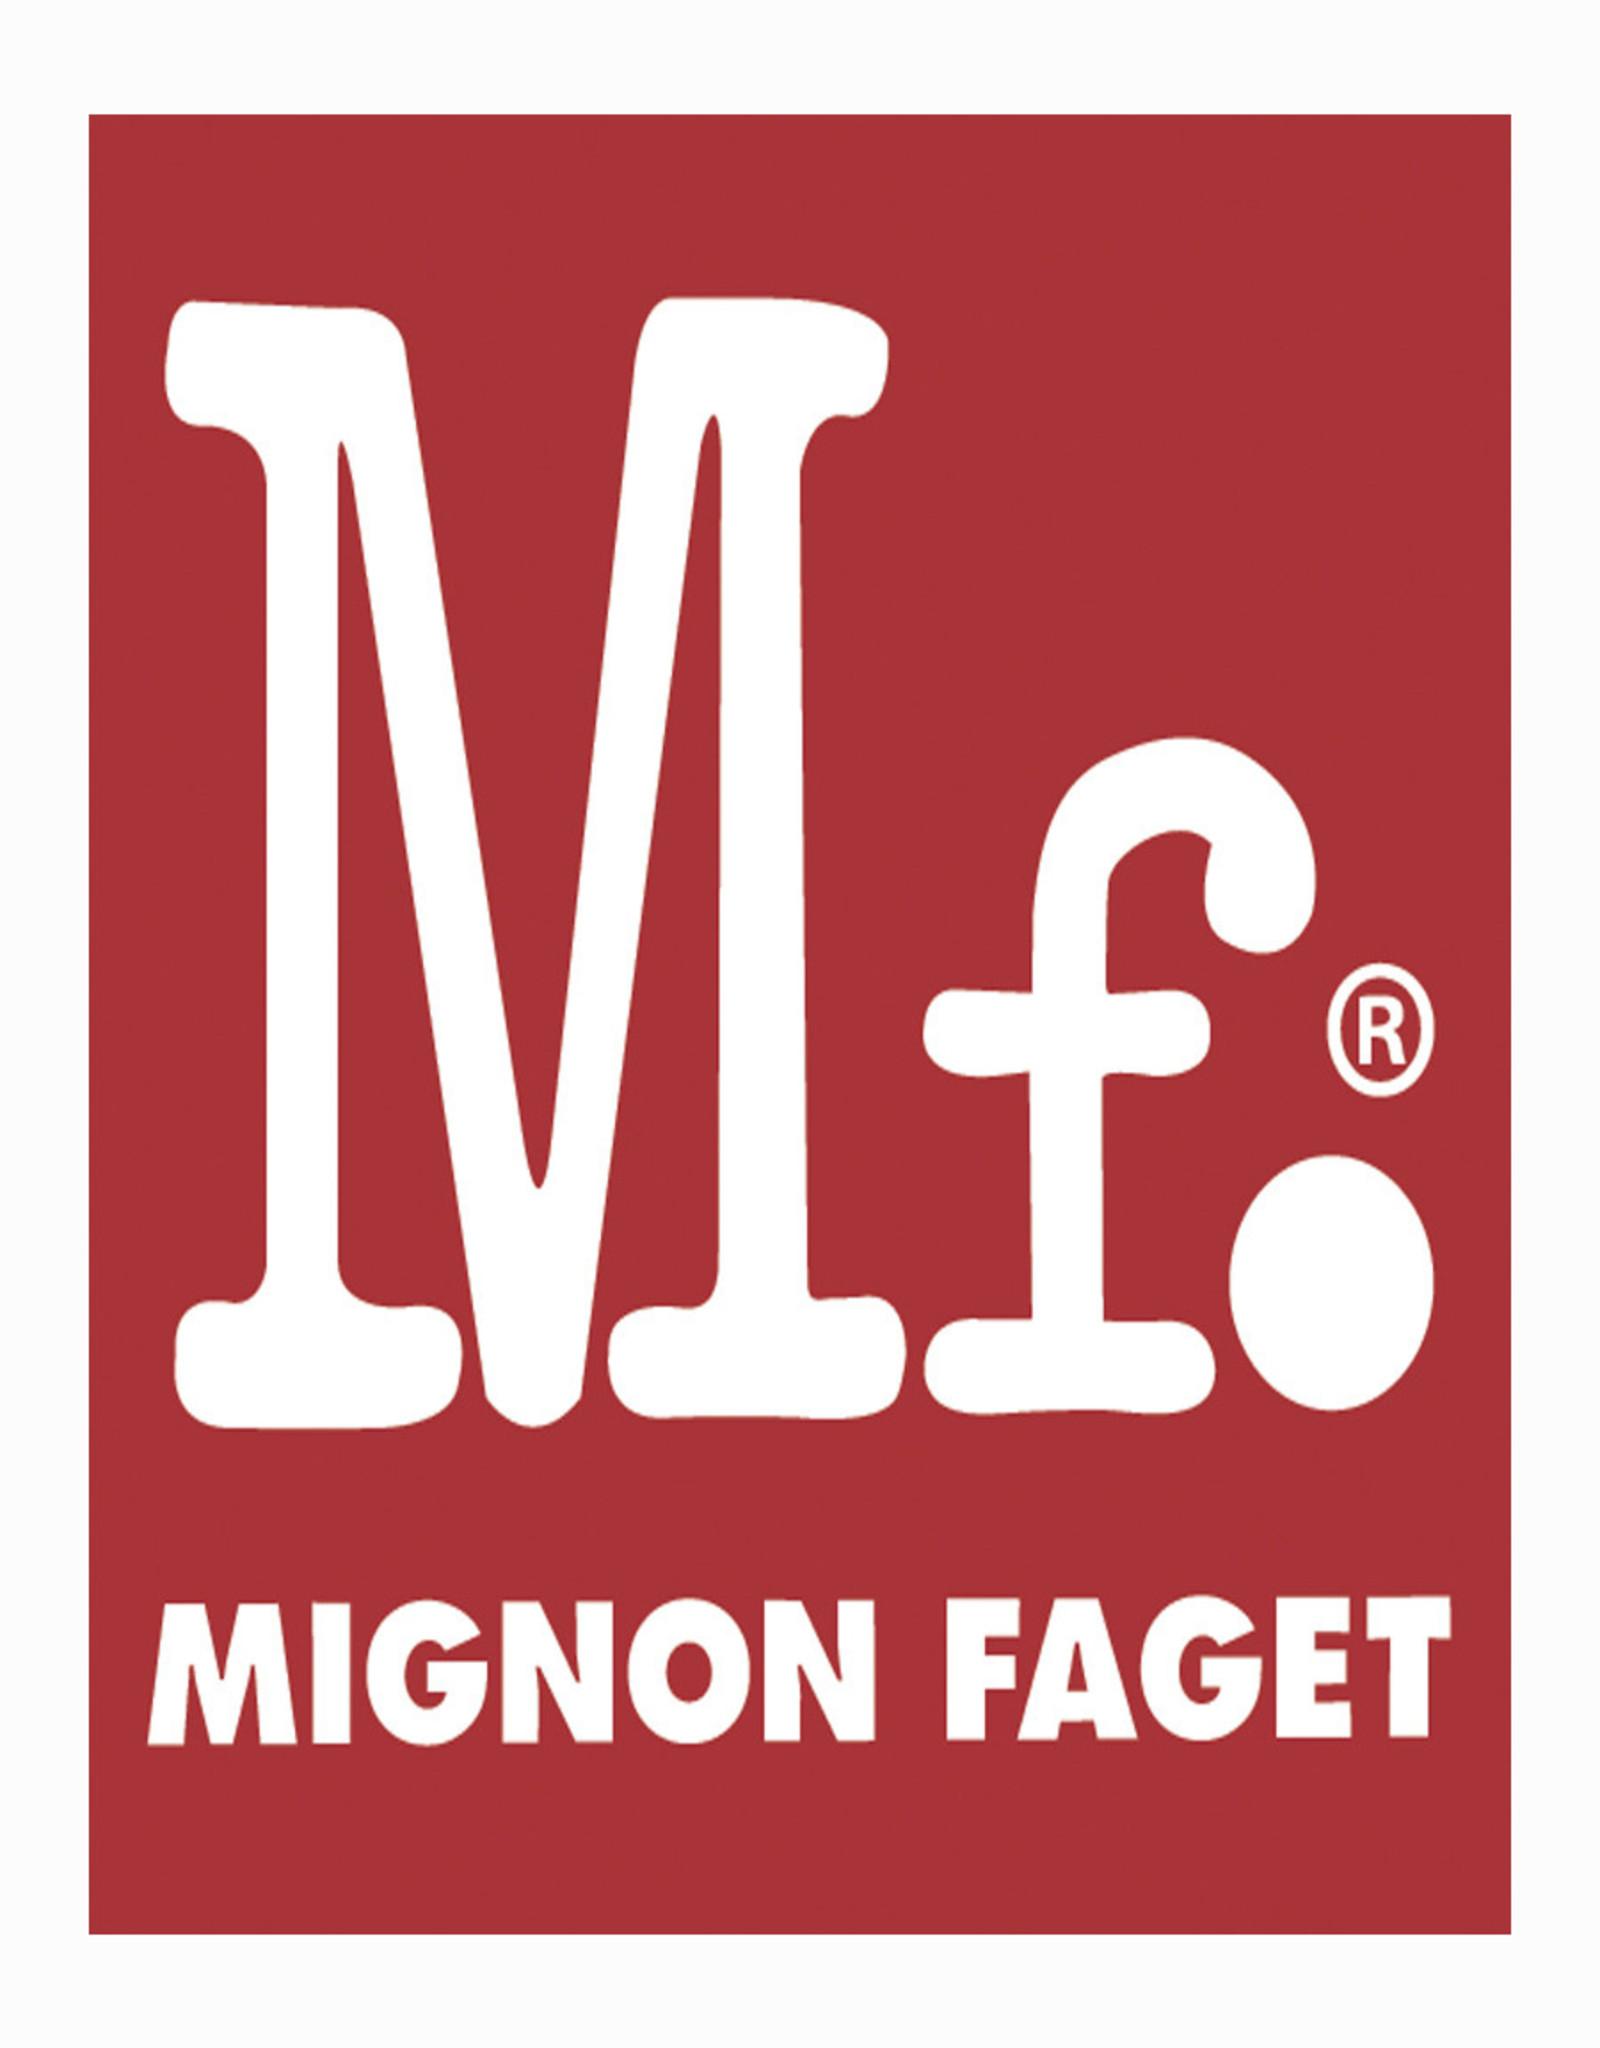 Mignon Faget Mignon Faget Hive Pearl Stations Necklace Bronze